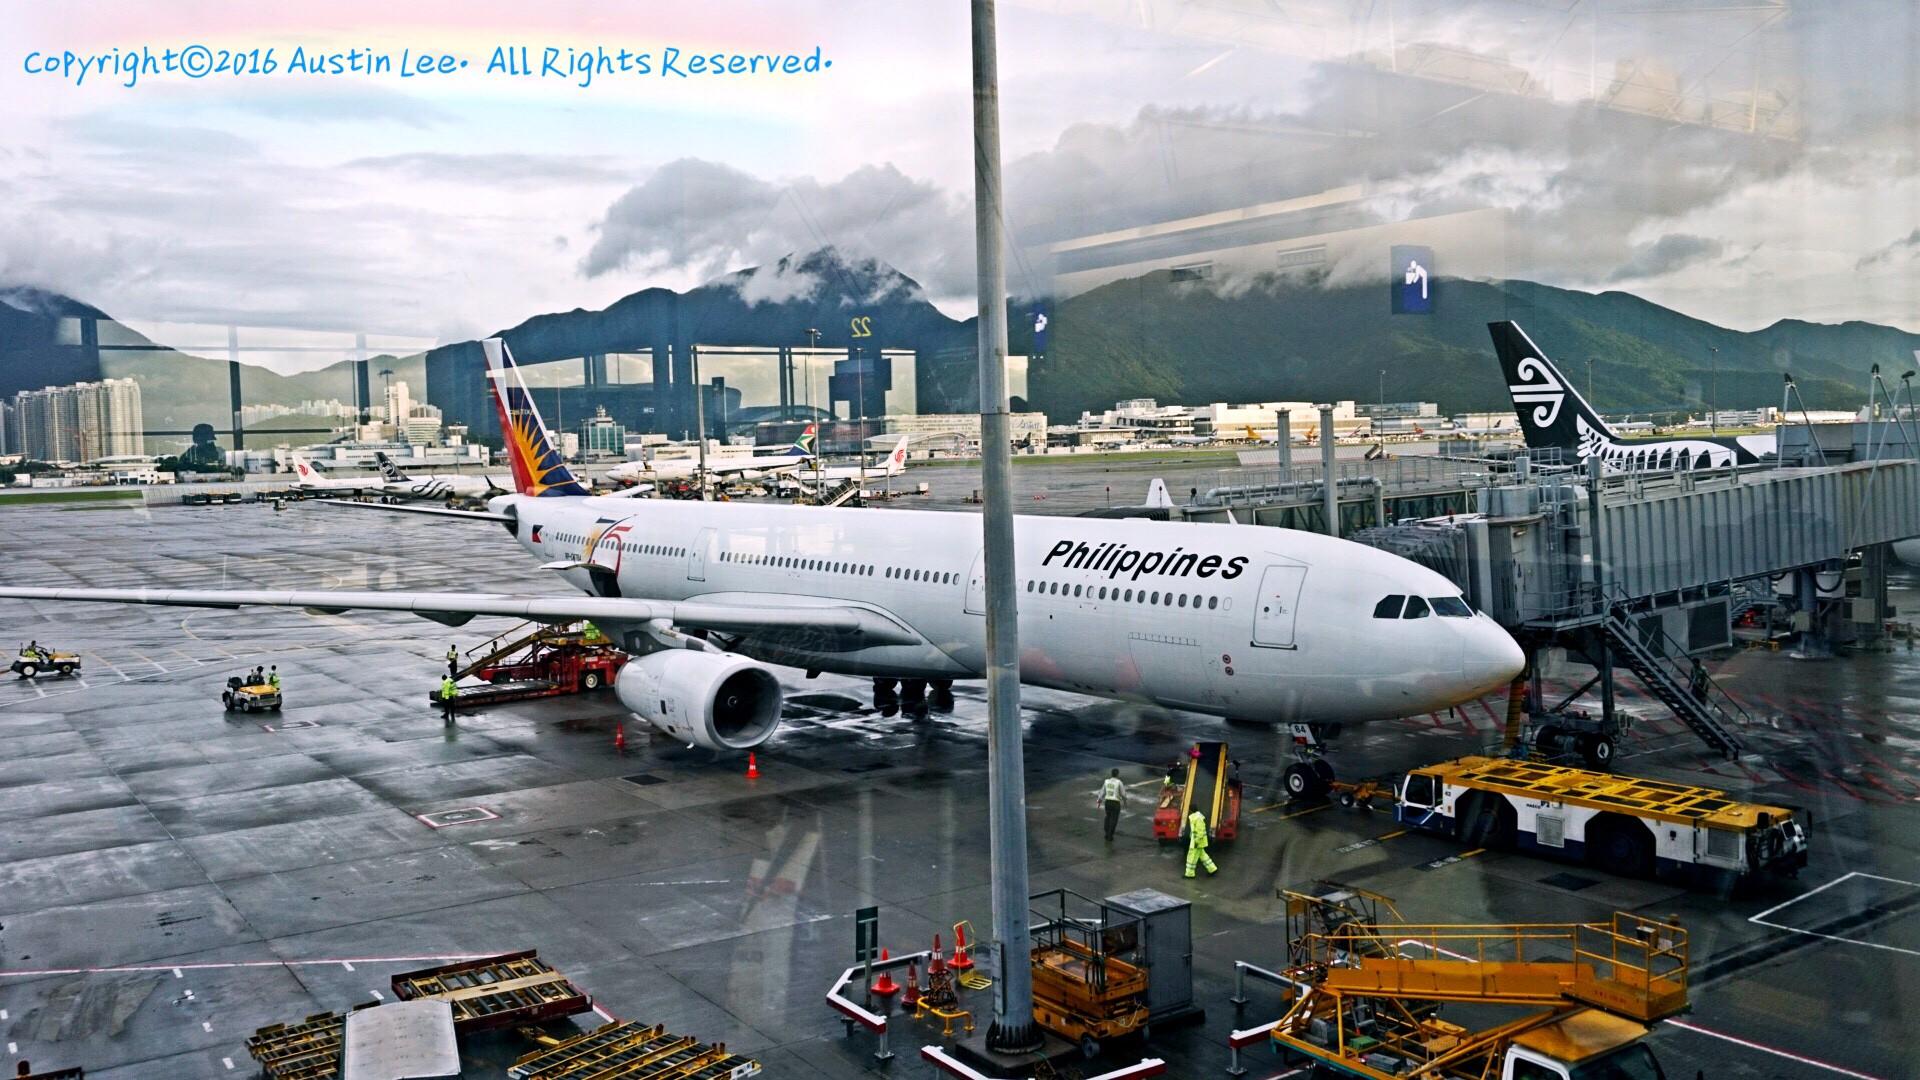 Re:[原创]论坛修复后第一波~三年来旅游途中的拍机精选~ AIRBUS A330-343 RP-C8784 中国香港国际机场